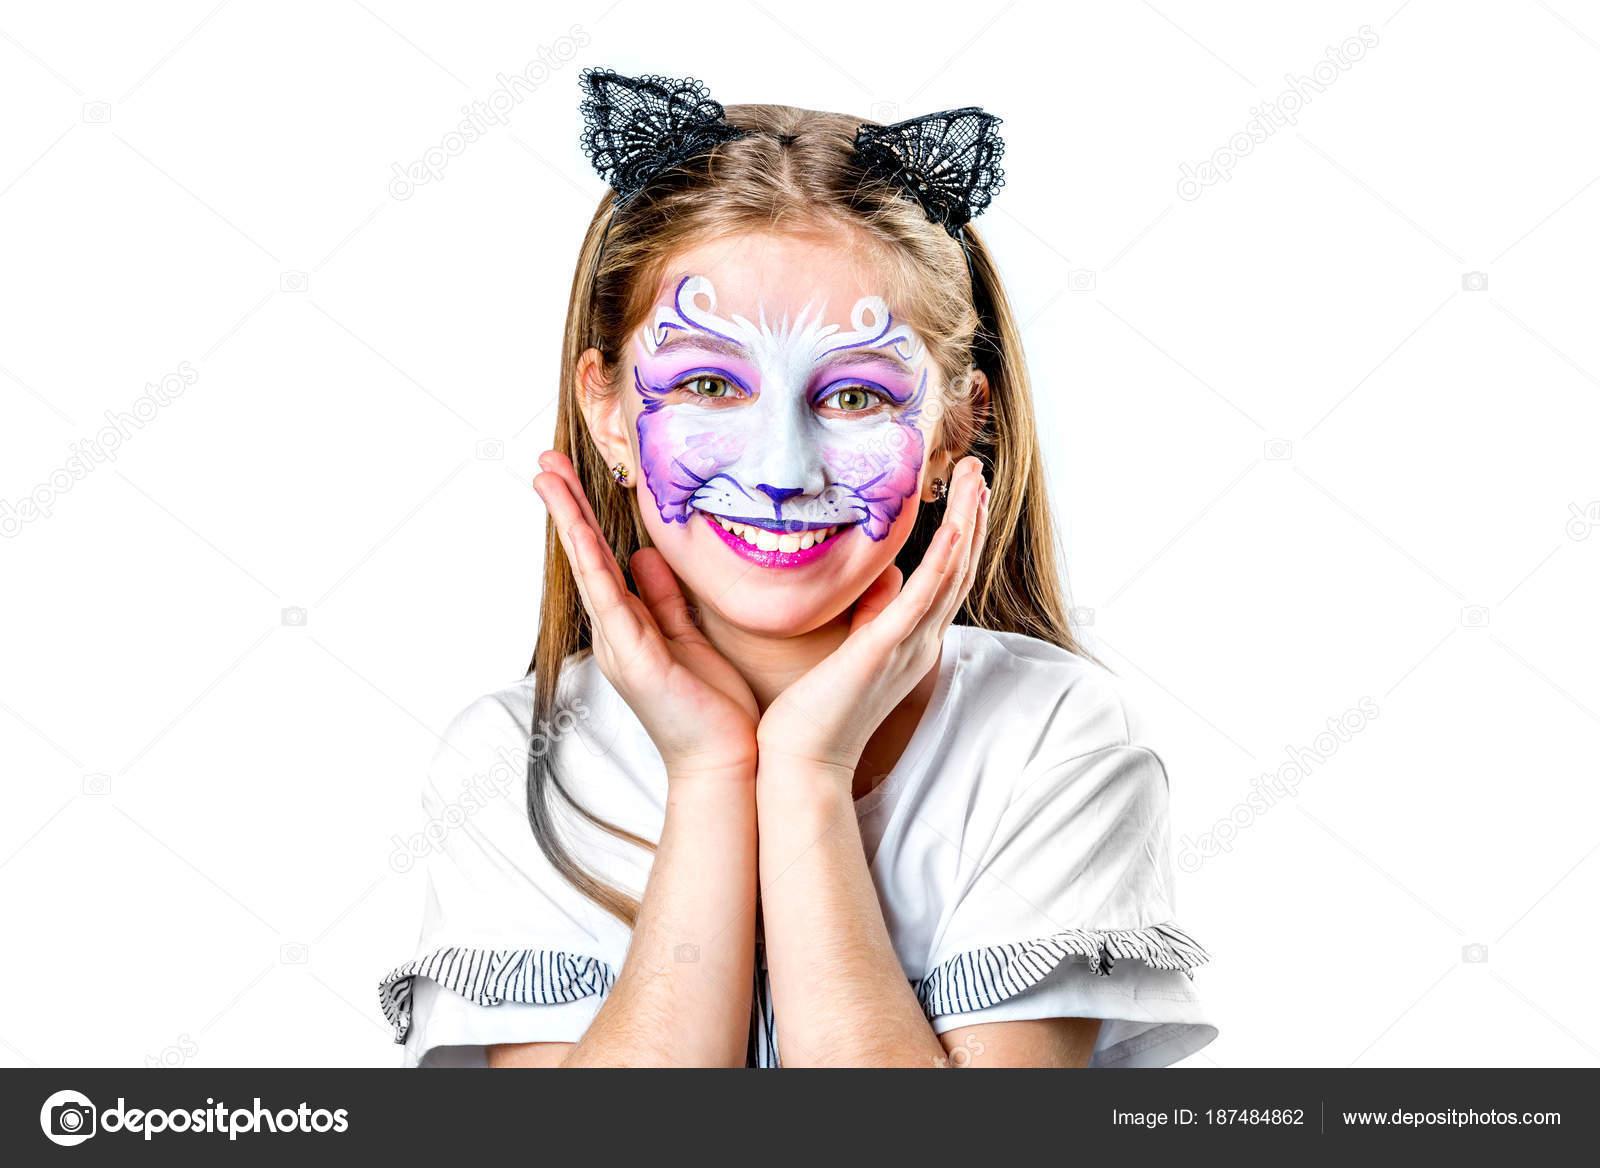 Podobizna Divenky S Cat Facepainting Stock Fotografie C Tan4ikk